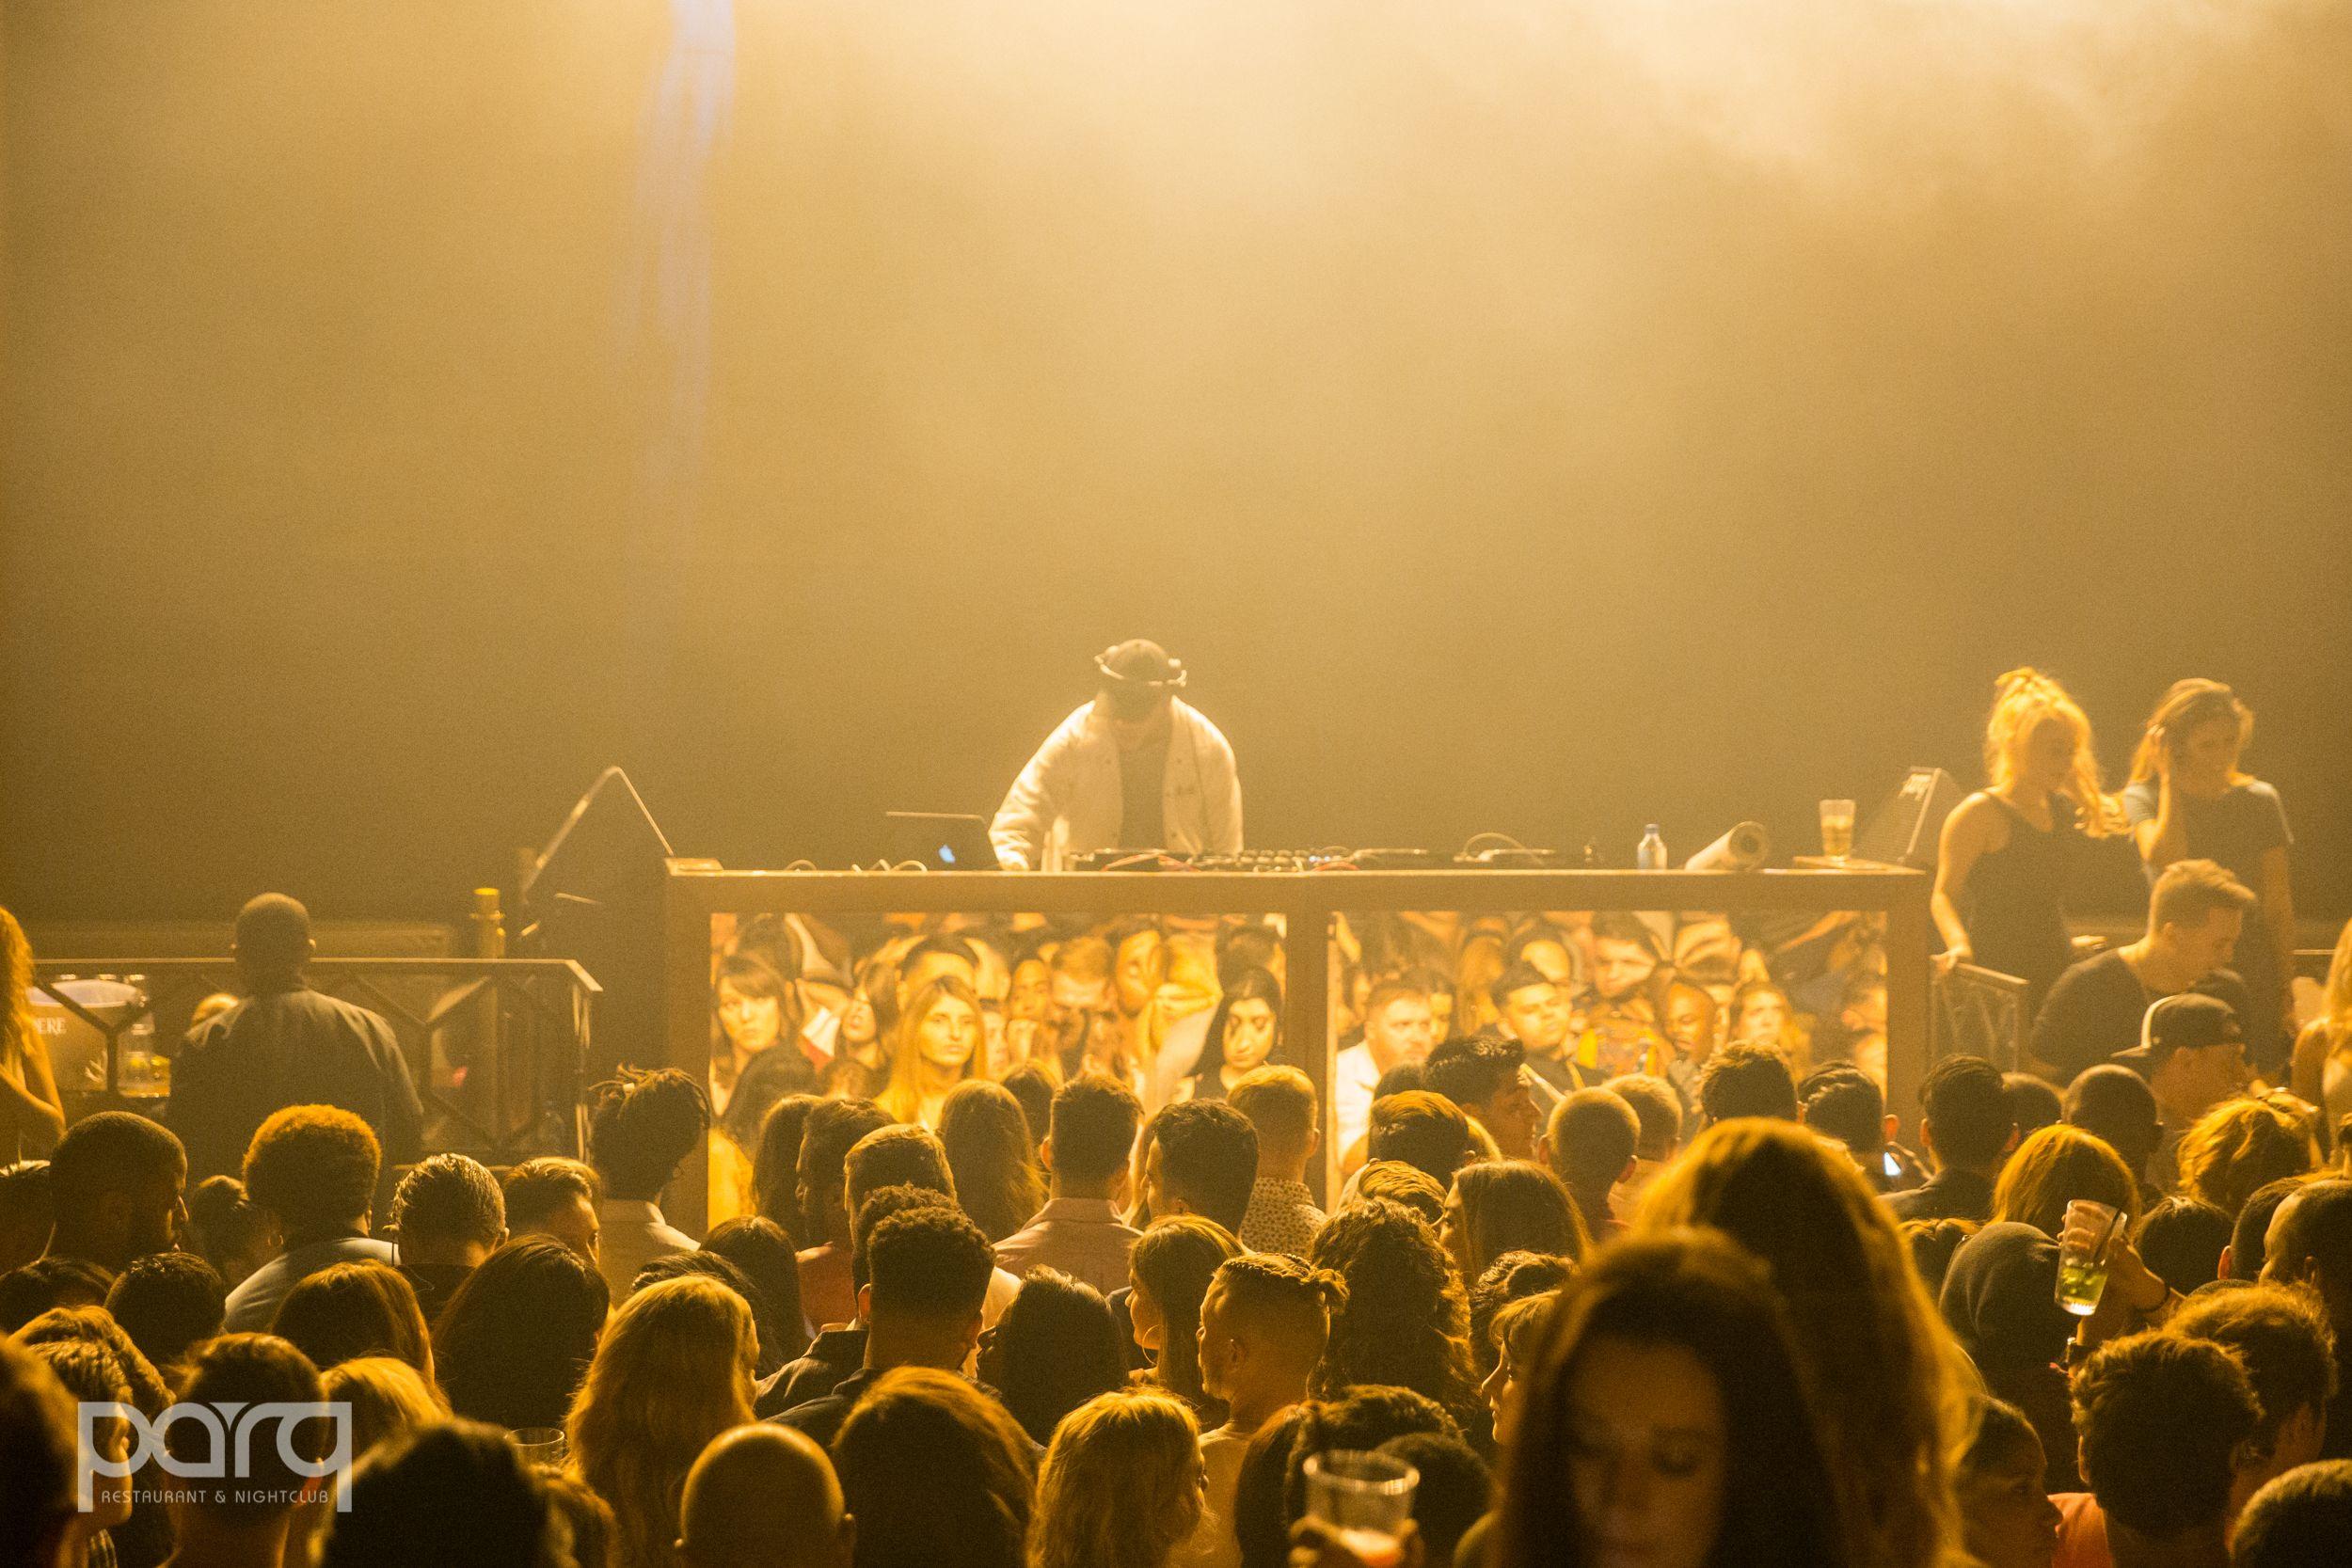 02.18.18 Parq - DJ Drama-18.jpg